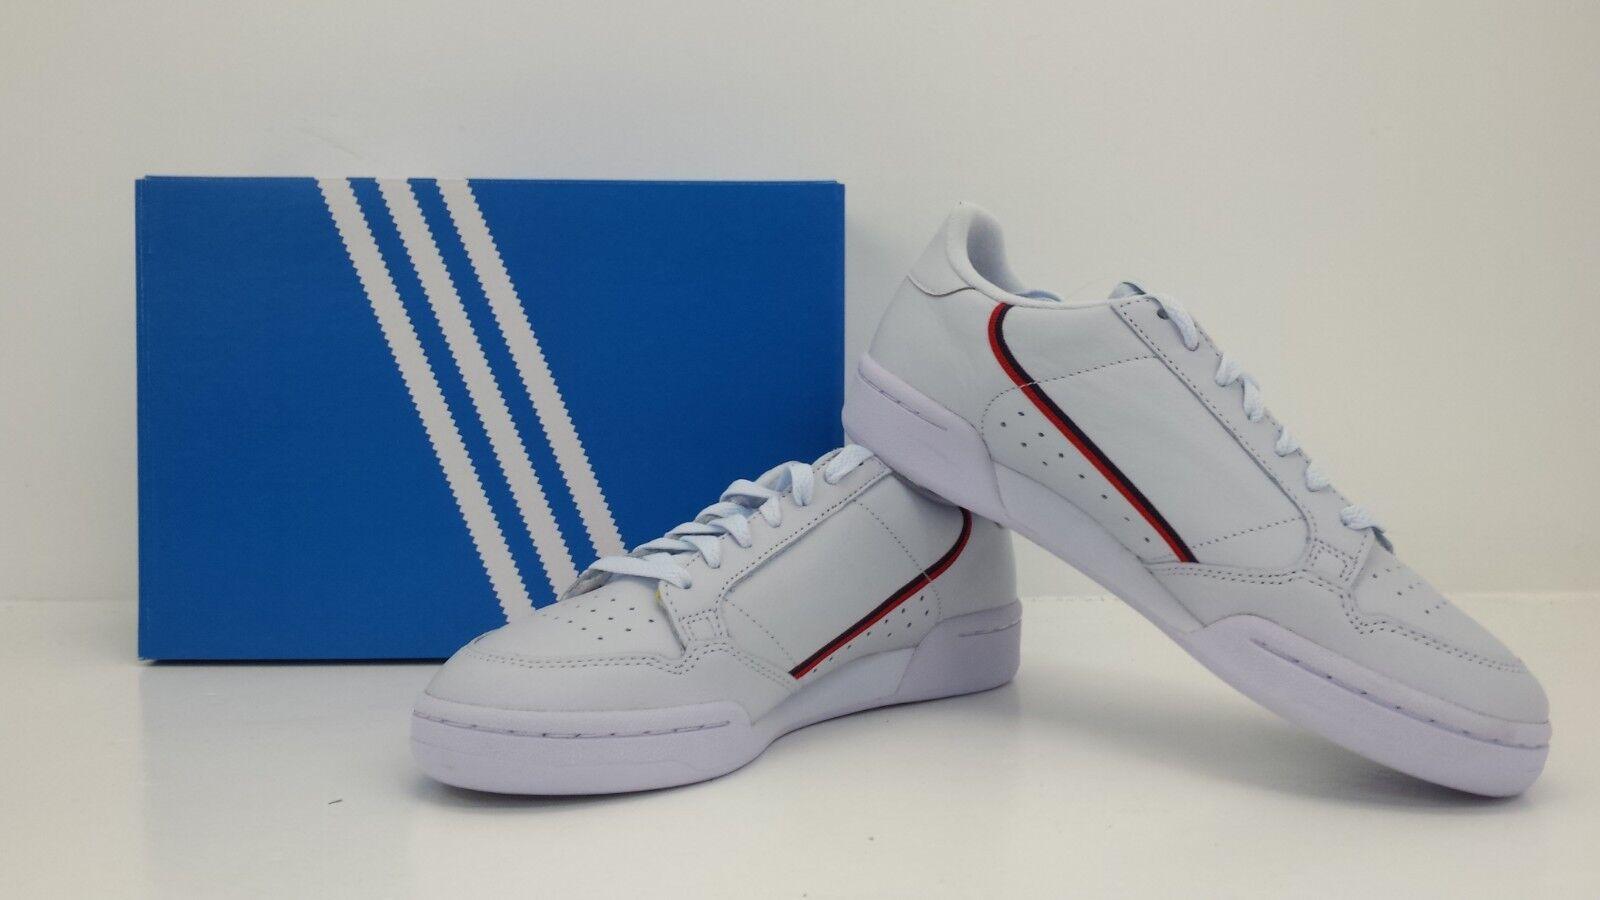 896079681b99c Adidas Originals Men s Continental 80 bluee Scar Navy B41673 - BRAND NEW IN  BOX